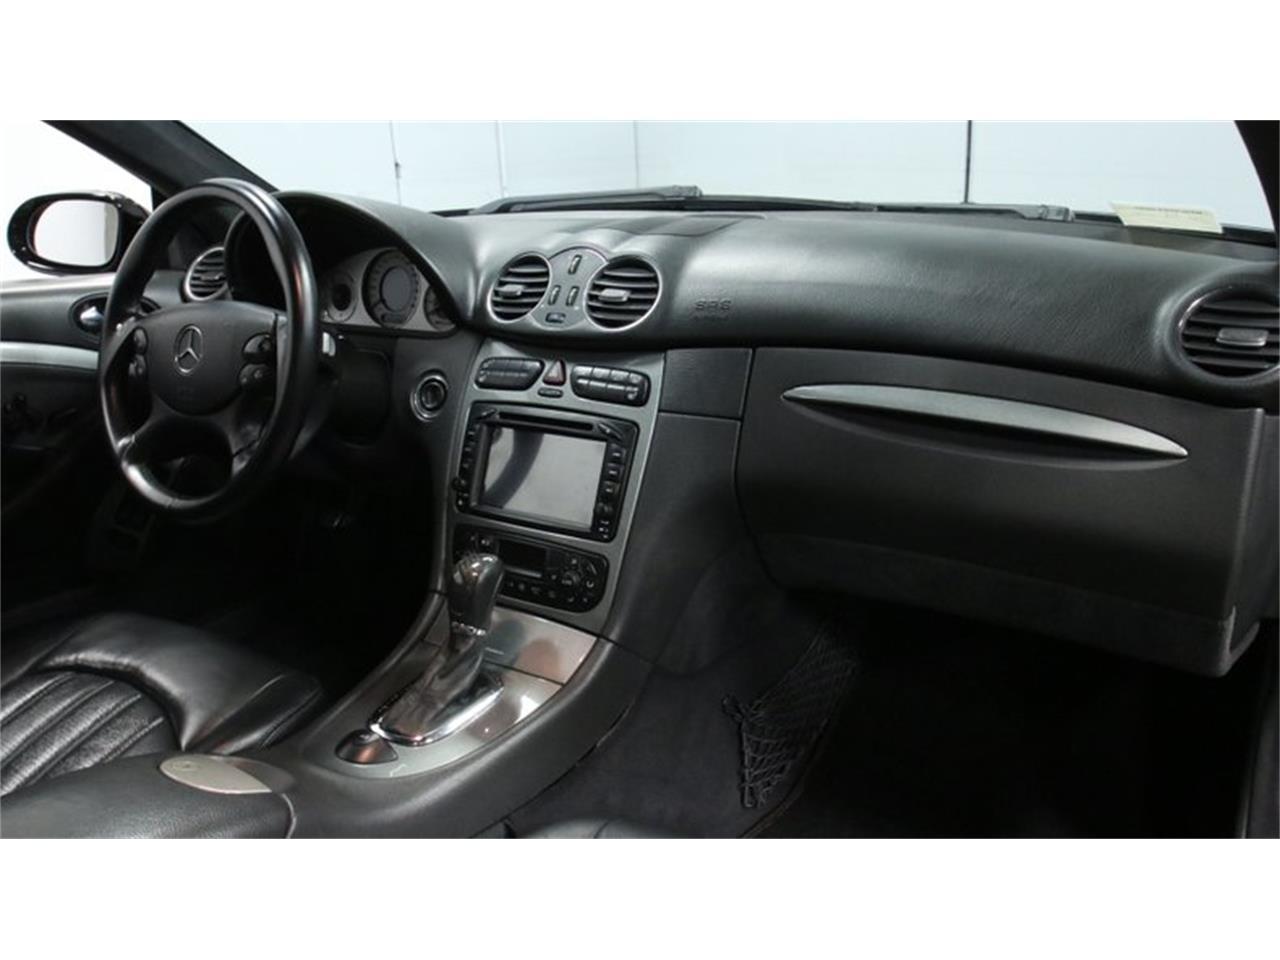 2004 Mercedes-Benz CLK (CC-1356832) for sale in Lithia Springs, Georgia